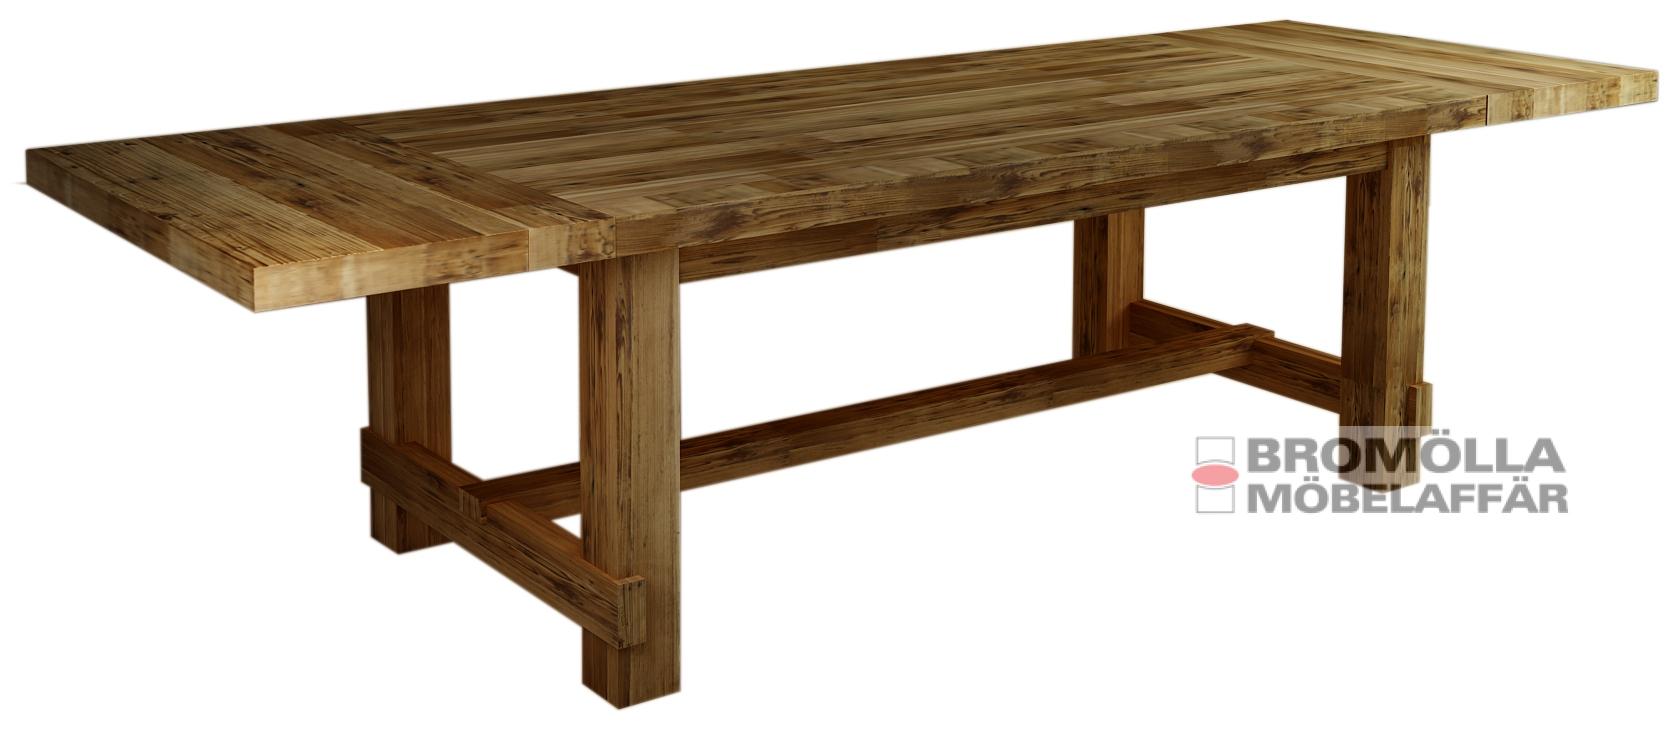 stort matbord 10 personer